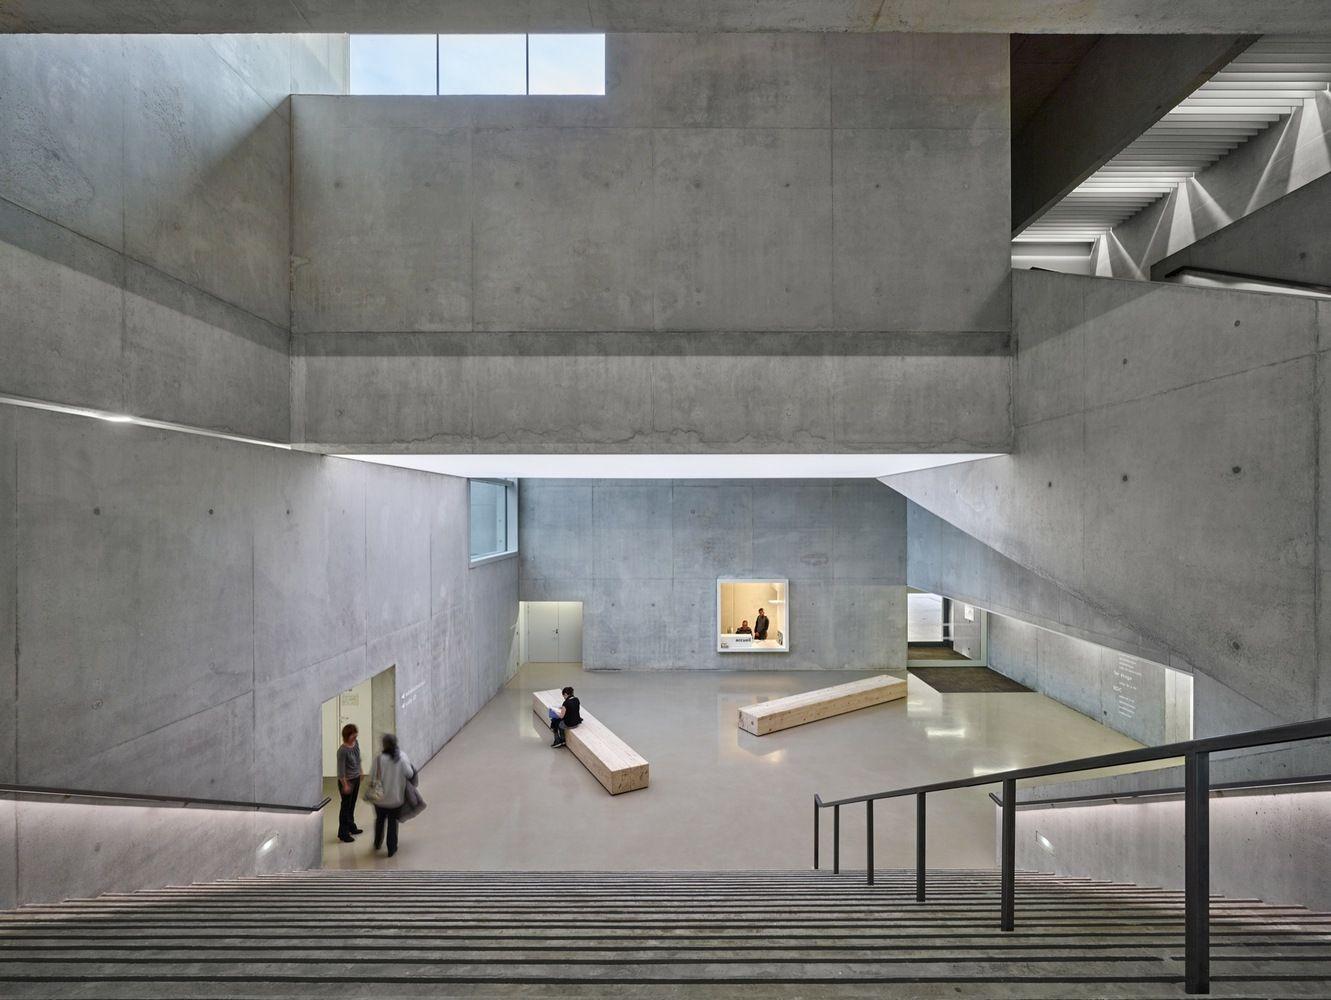 Gallery of henri dutilleux conservatoire dominique coulon associ s 30 architecture - Cabinet architecte strasbourg ...